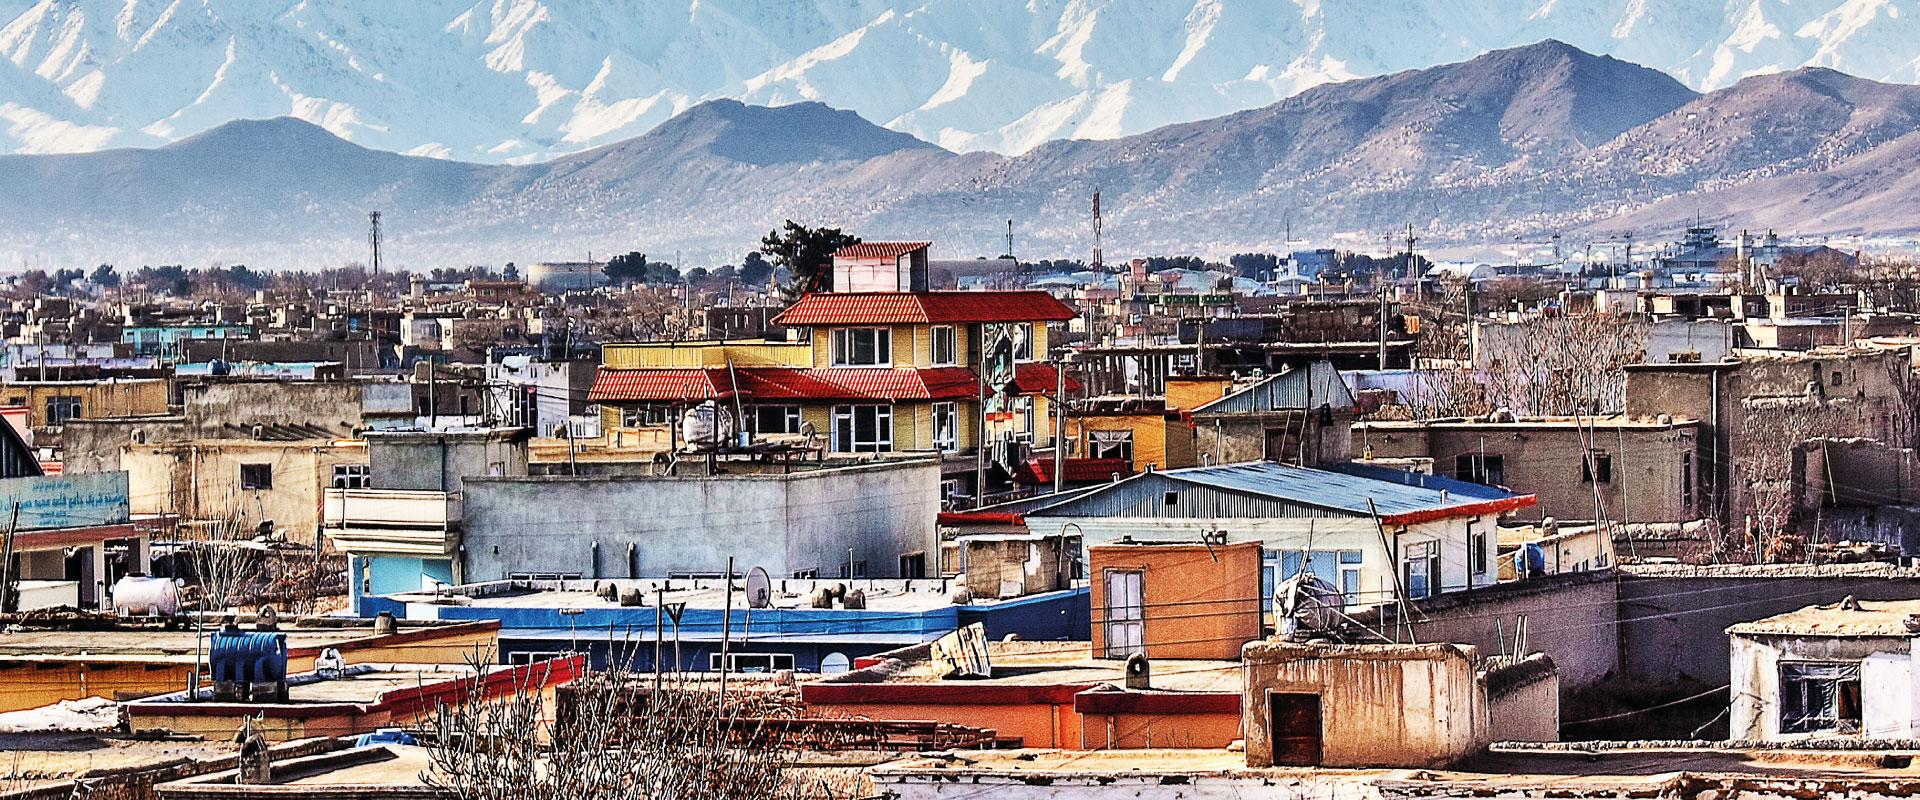 Royal Travel Manchester | Kabul | Kabul Afghanistan